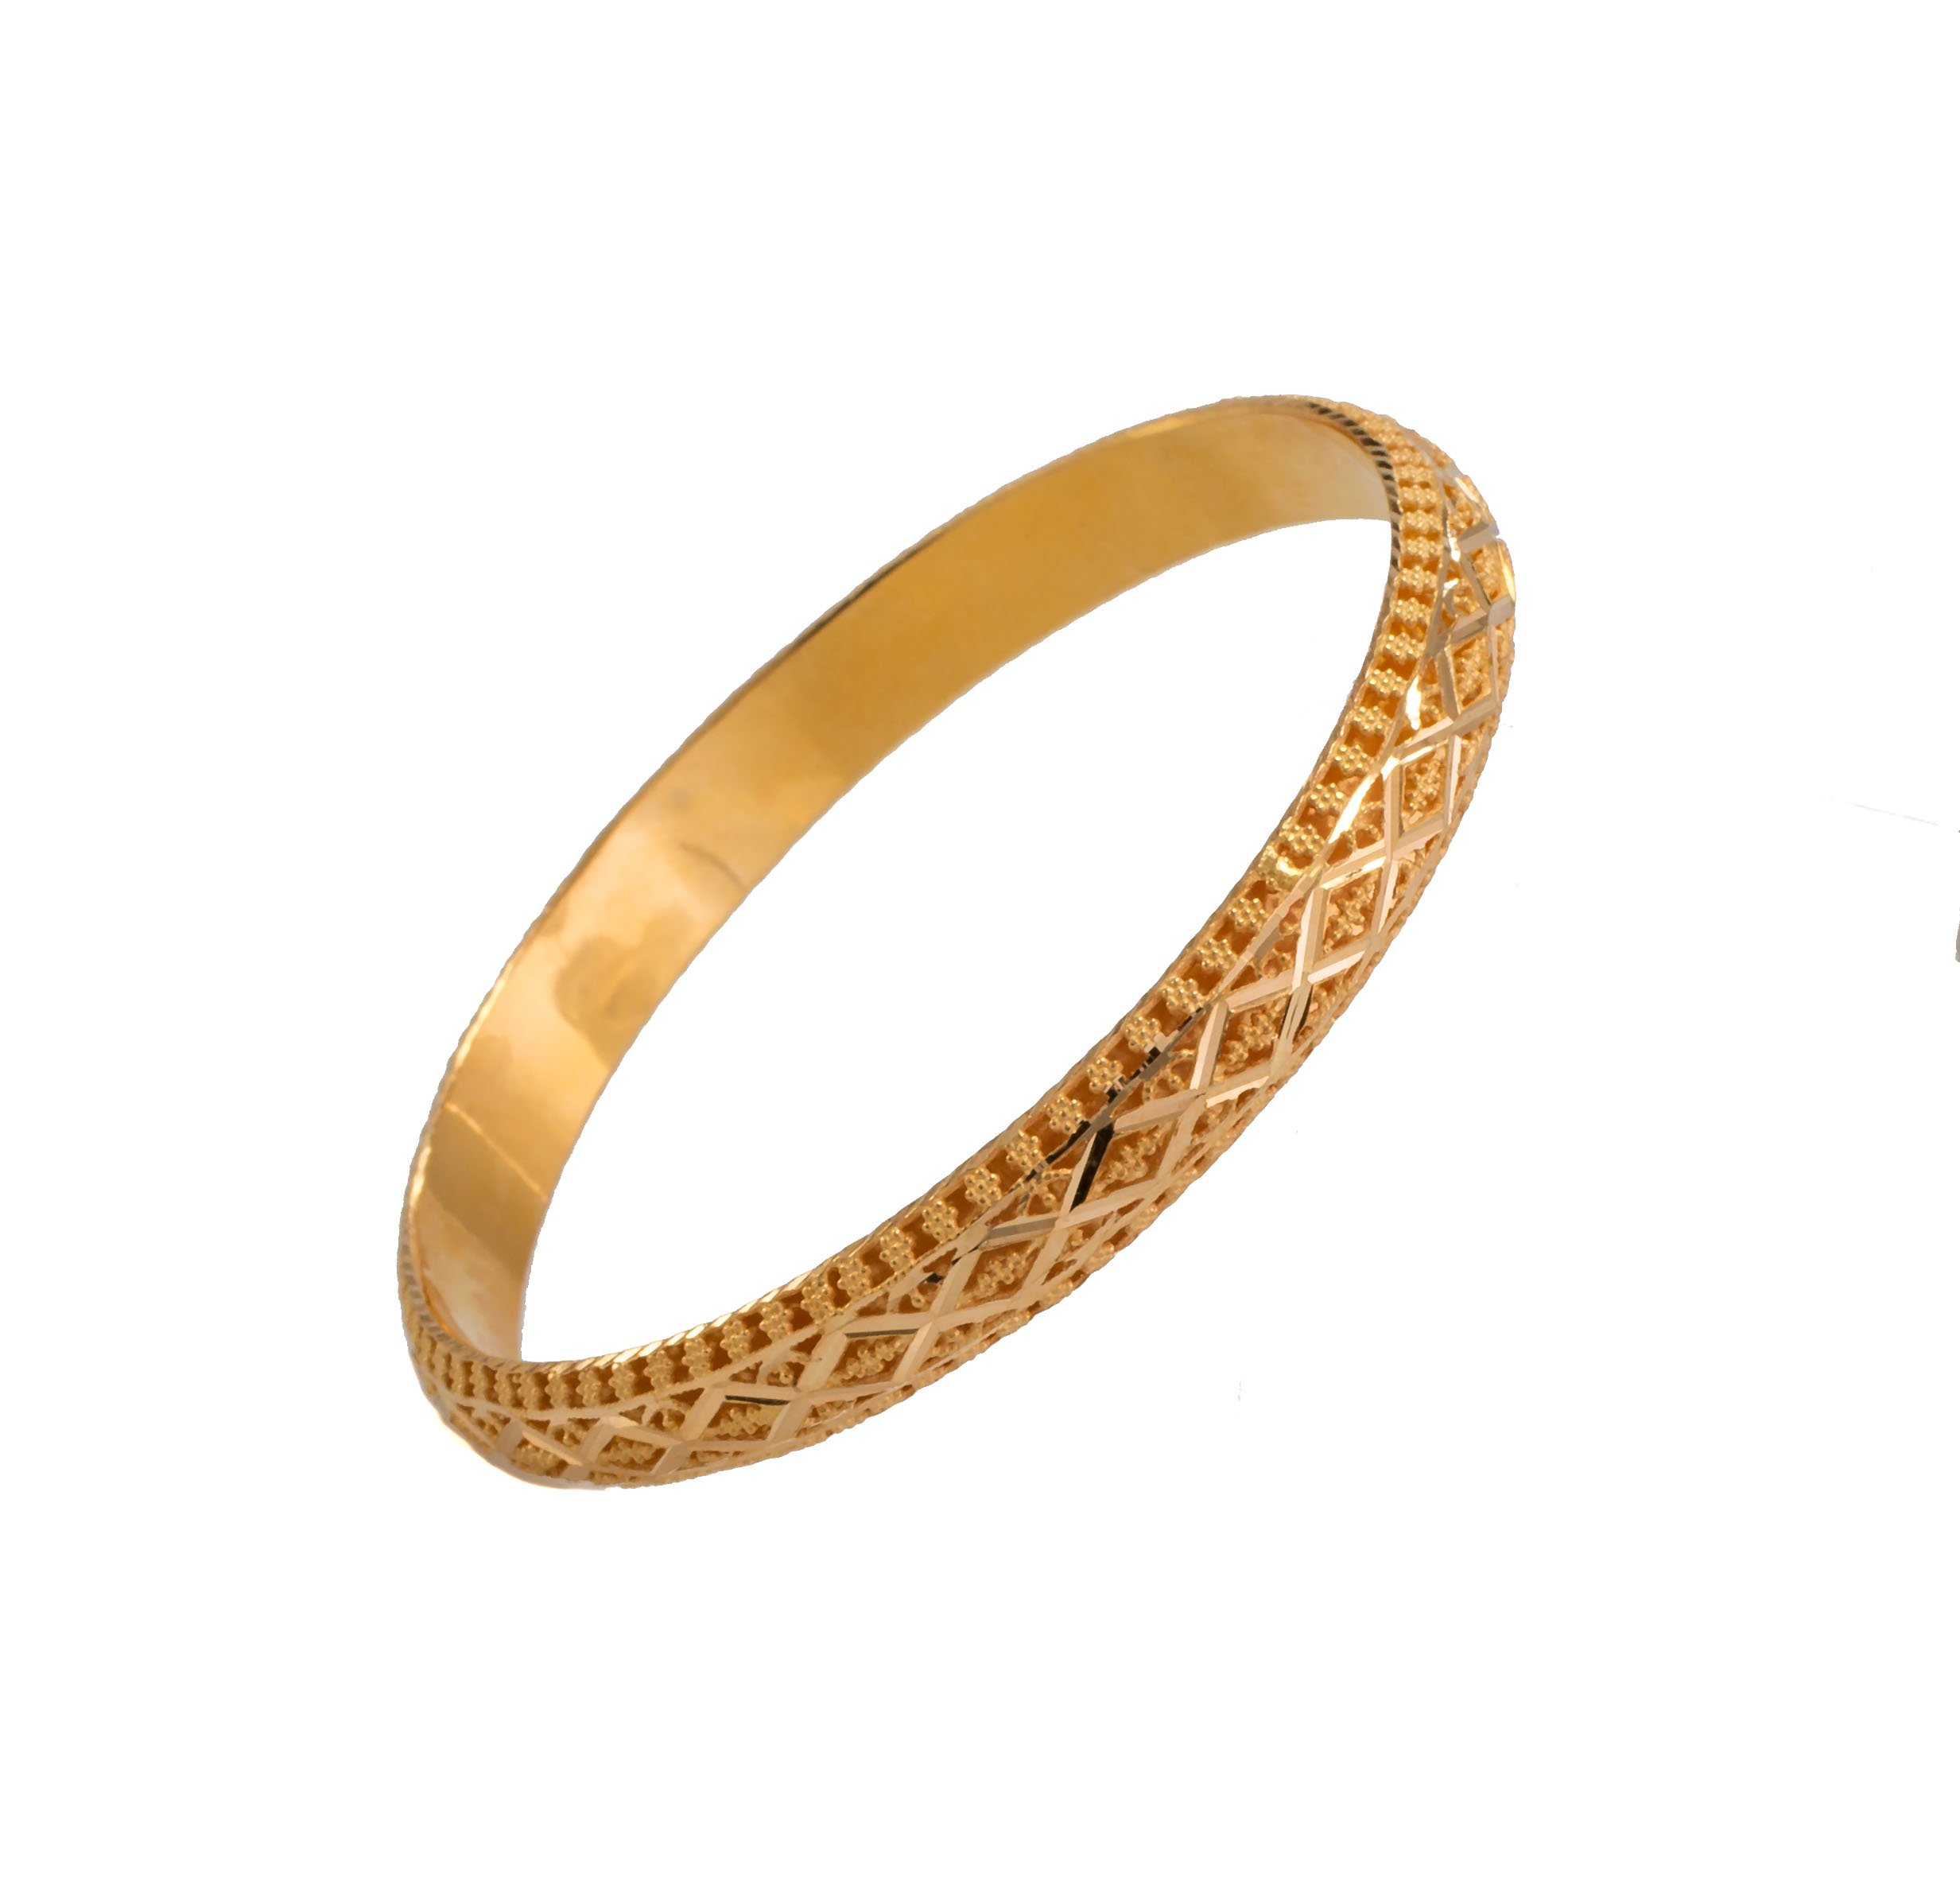 Elegant & Stylish 21k Gold Bracelet For Women By Evan Jewels –ELiteGolden Women's Bangle, Timeless Classic Design & Premium Craftsmanship, Perfect Birthday, Anniversary & Special Occasion Gift Idea